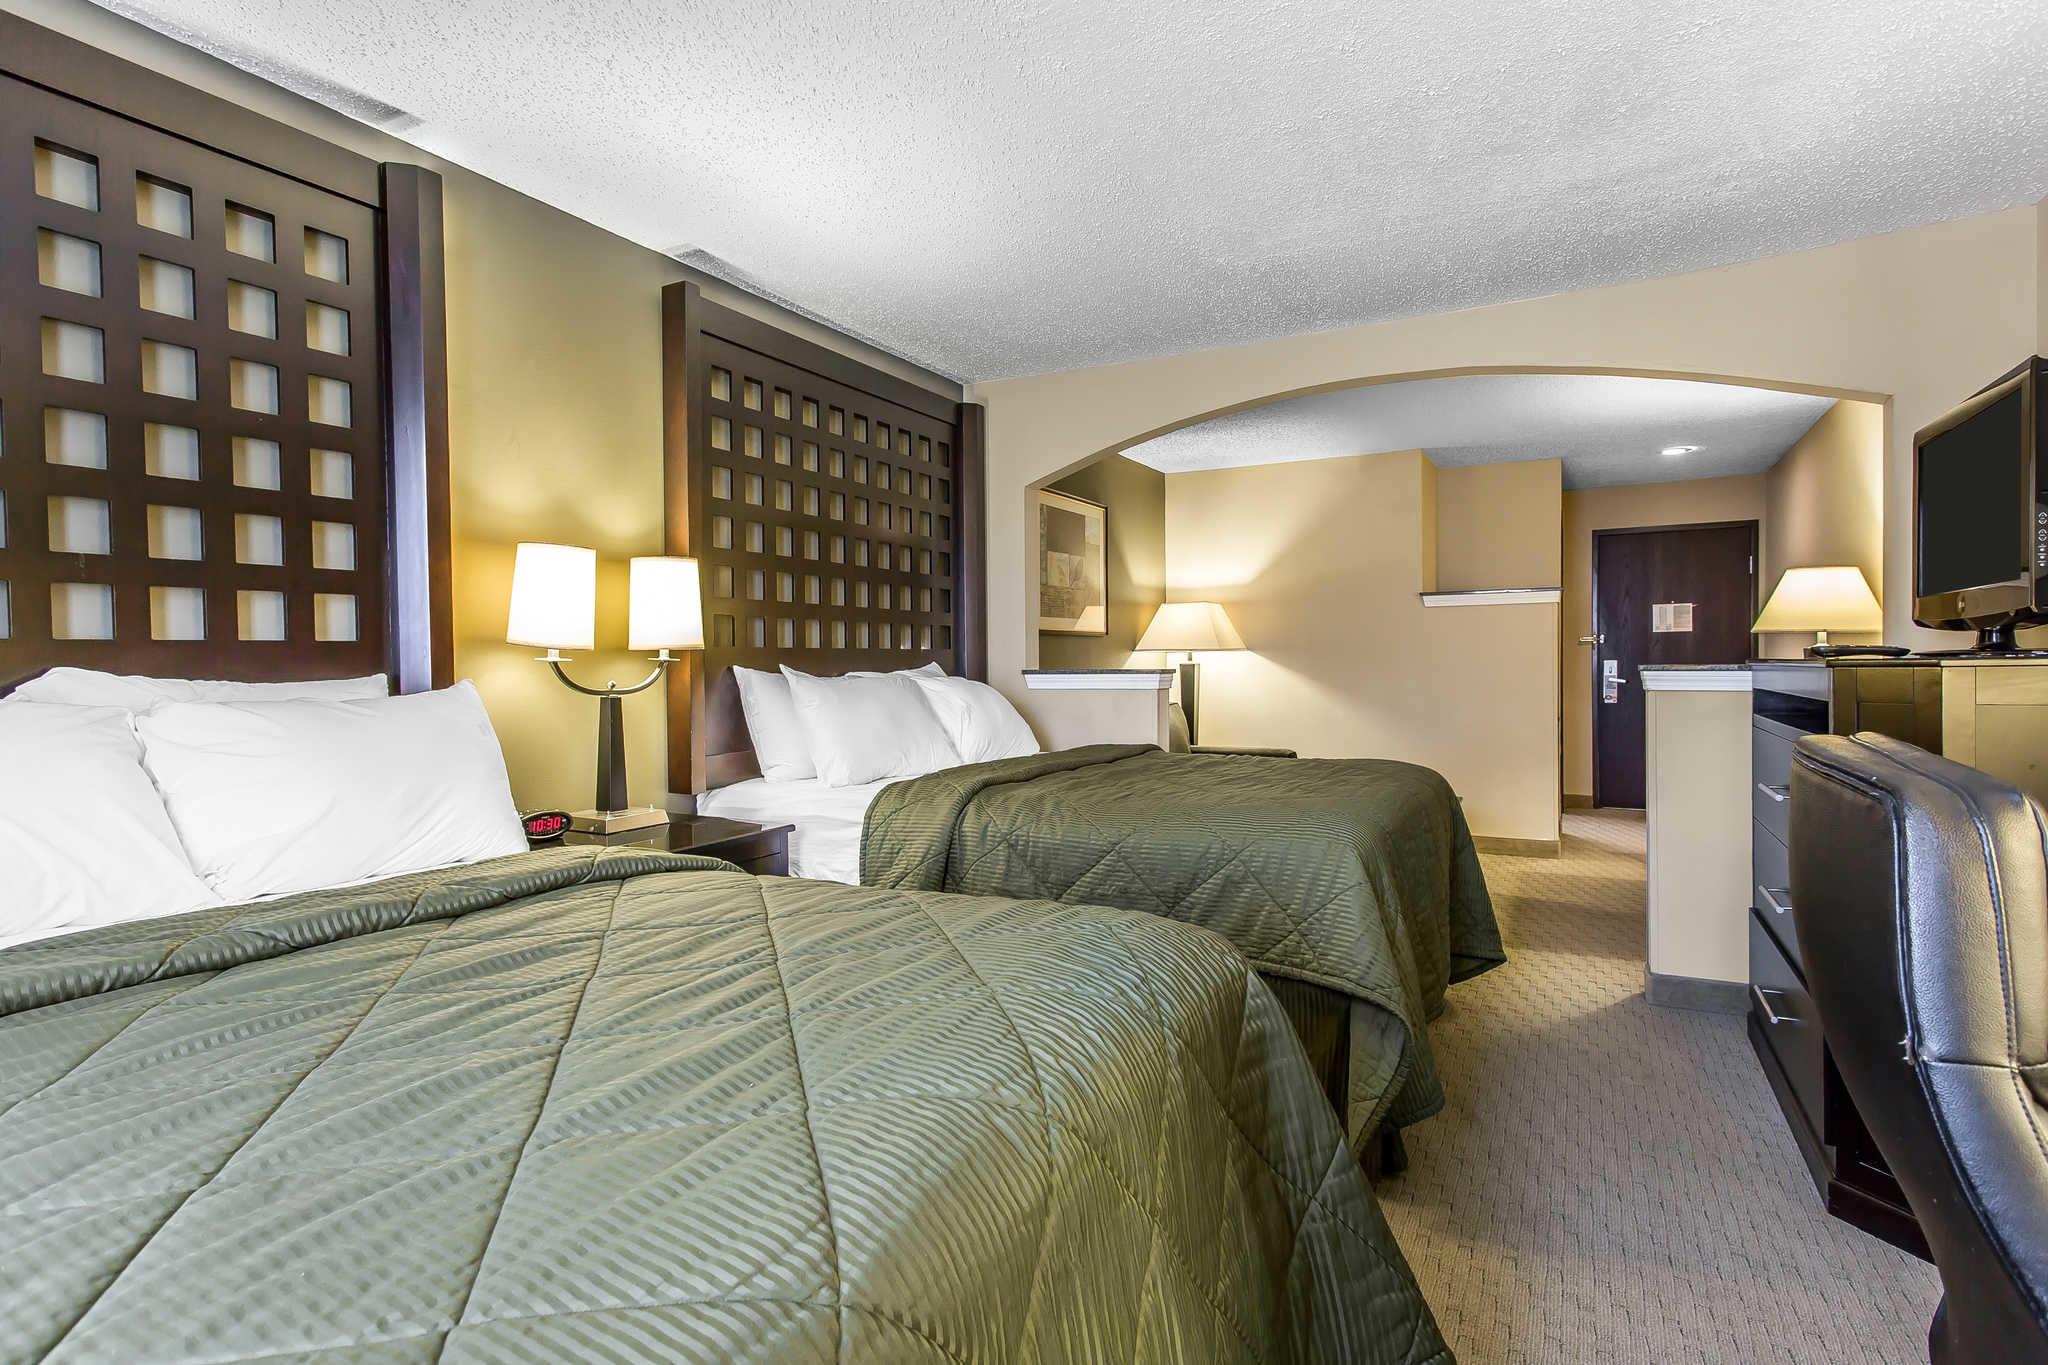 Quality Inn & Suites Durant image 22